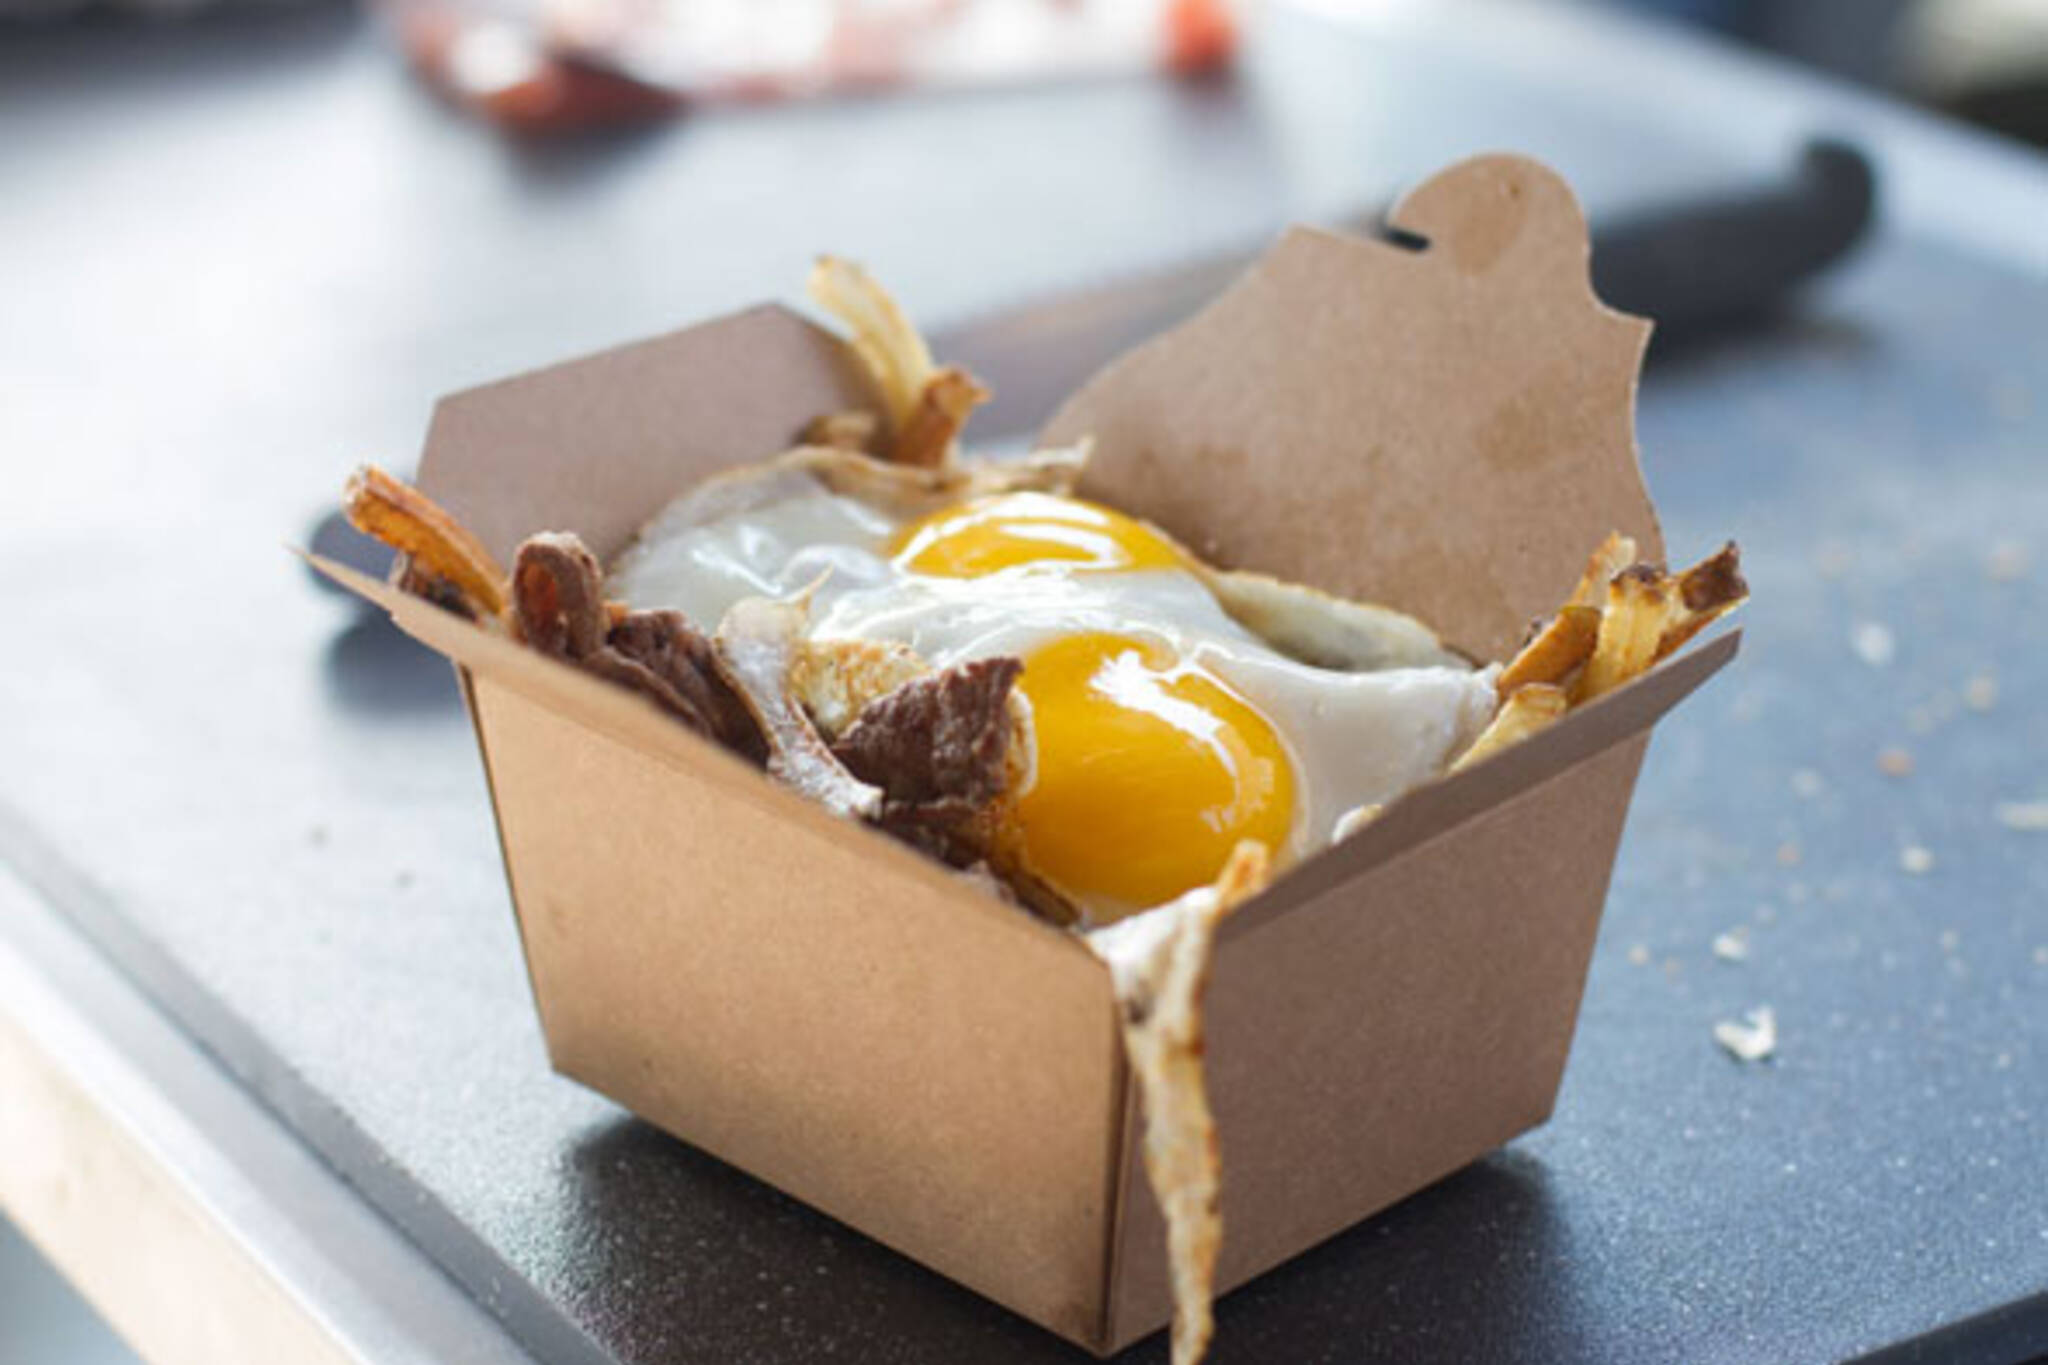 Steak and egg fries